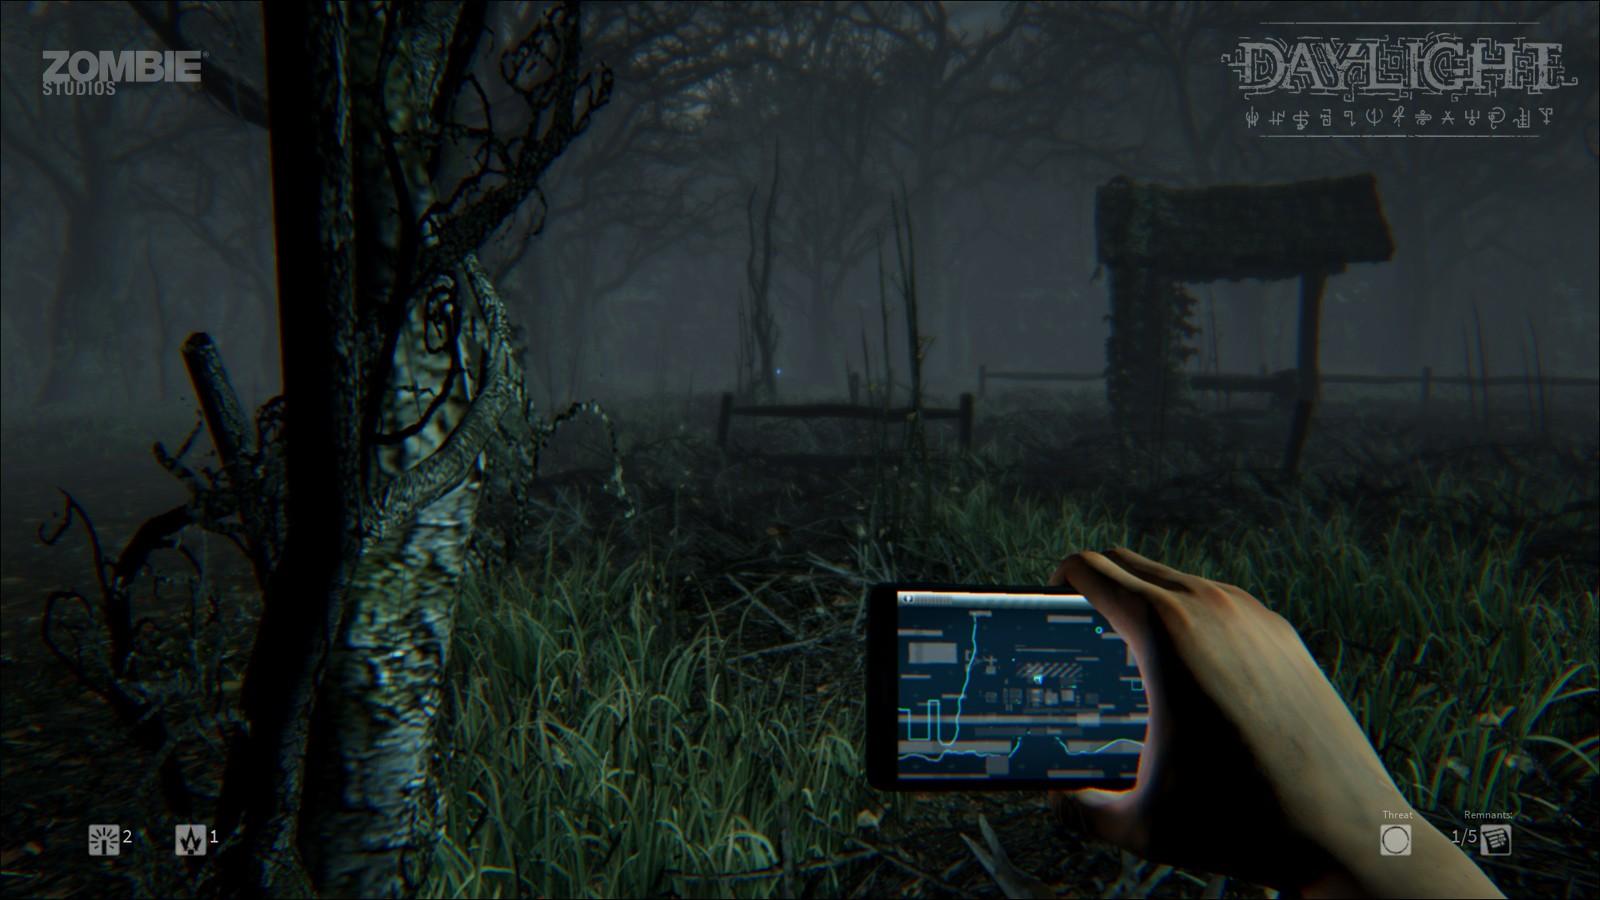 Daylight llegará a PS4 el día 8 de Abril 8pxn